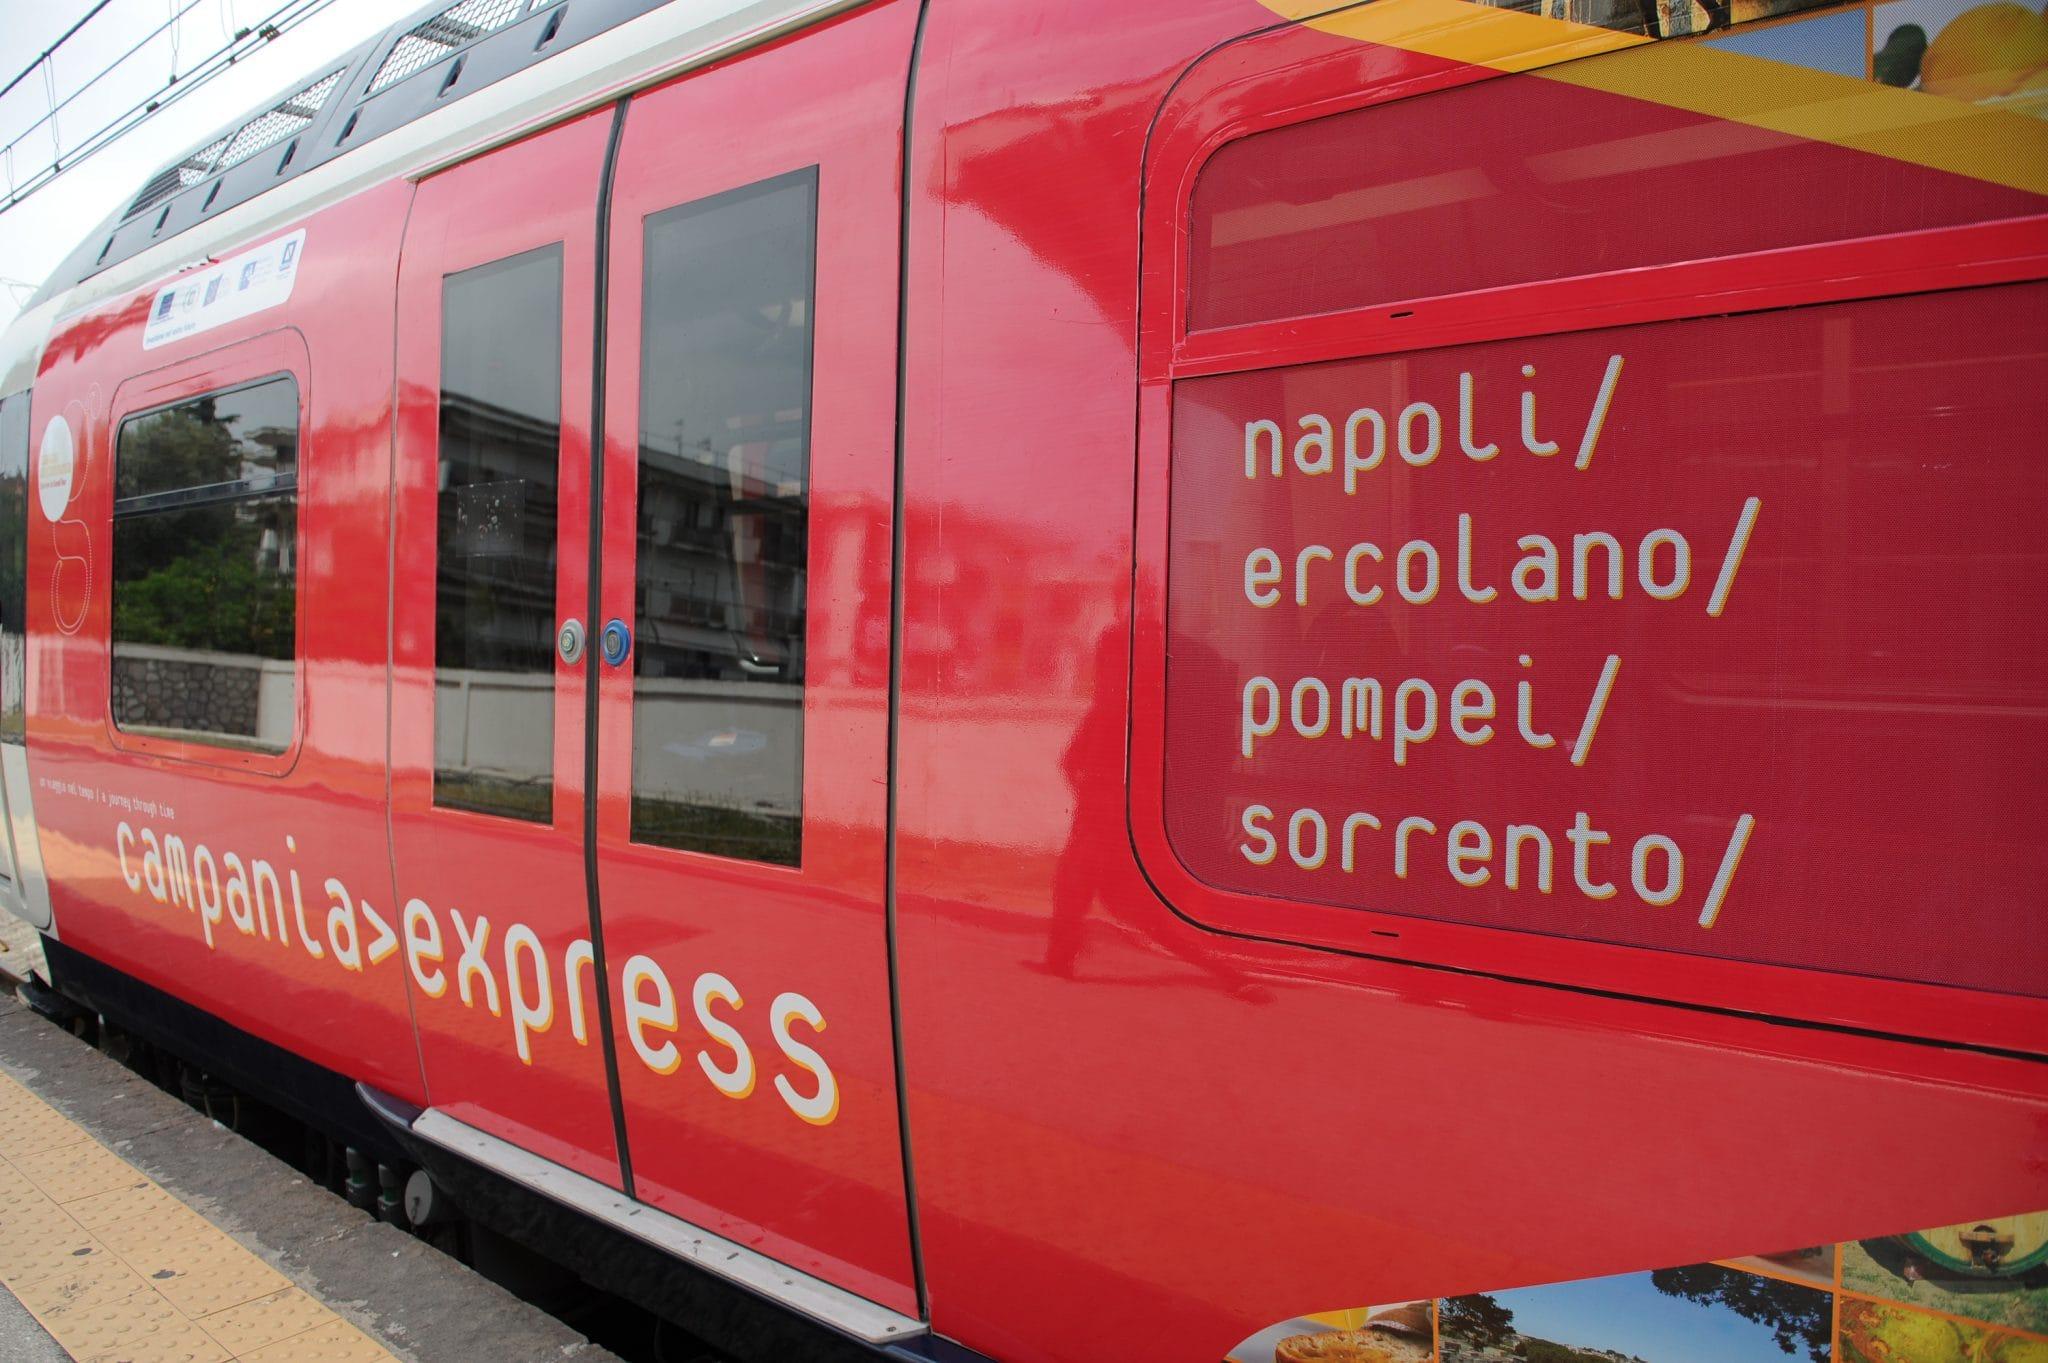 treno campania express